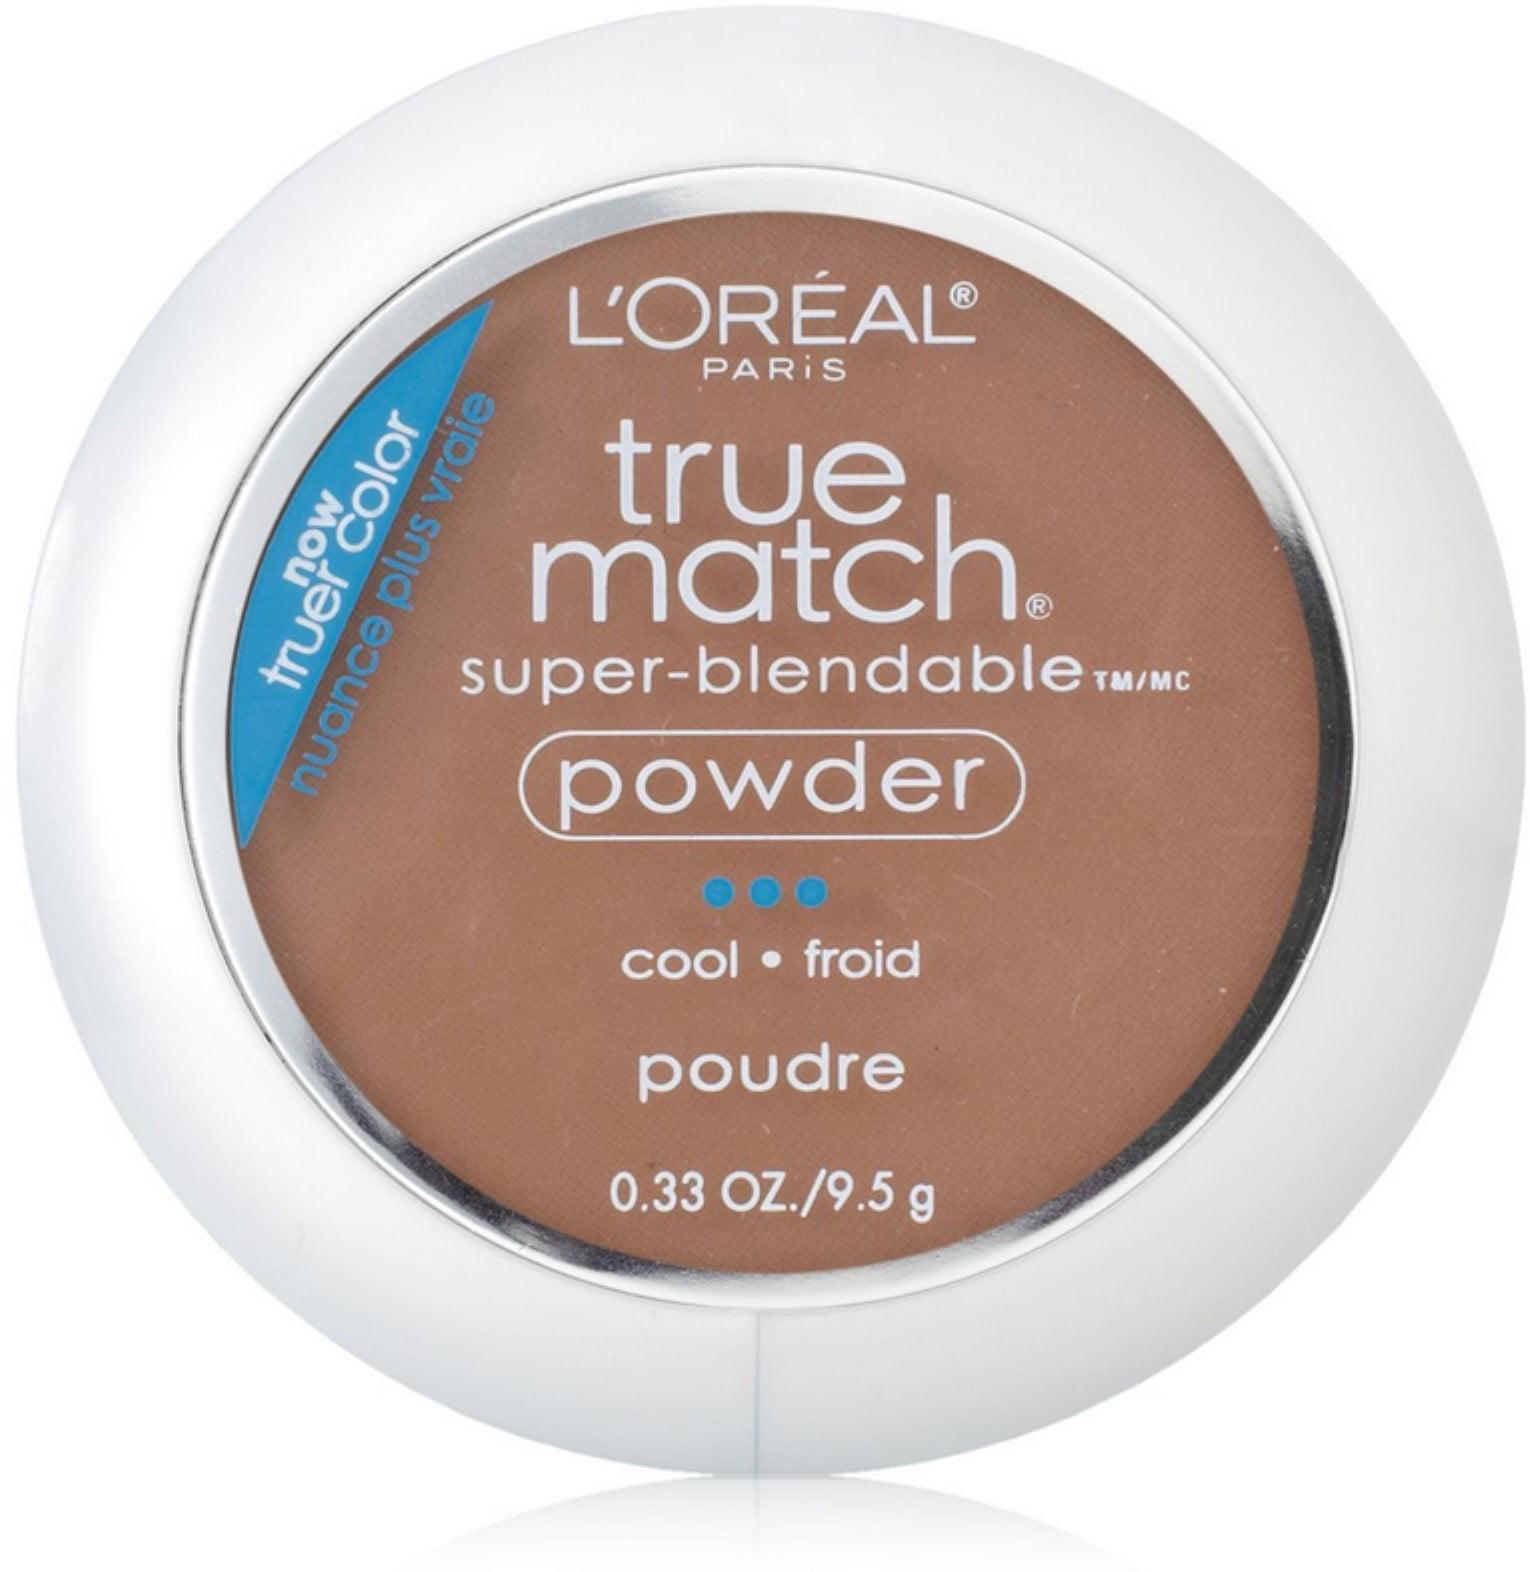 L'Oreal True Match Powder, Cocoa [C8], 0.33 oz (Pack of 2)